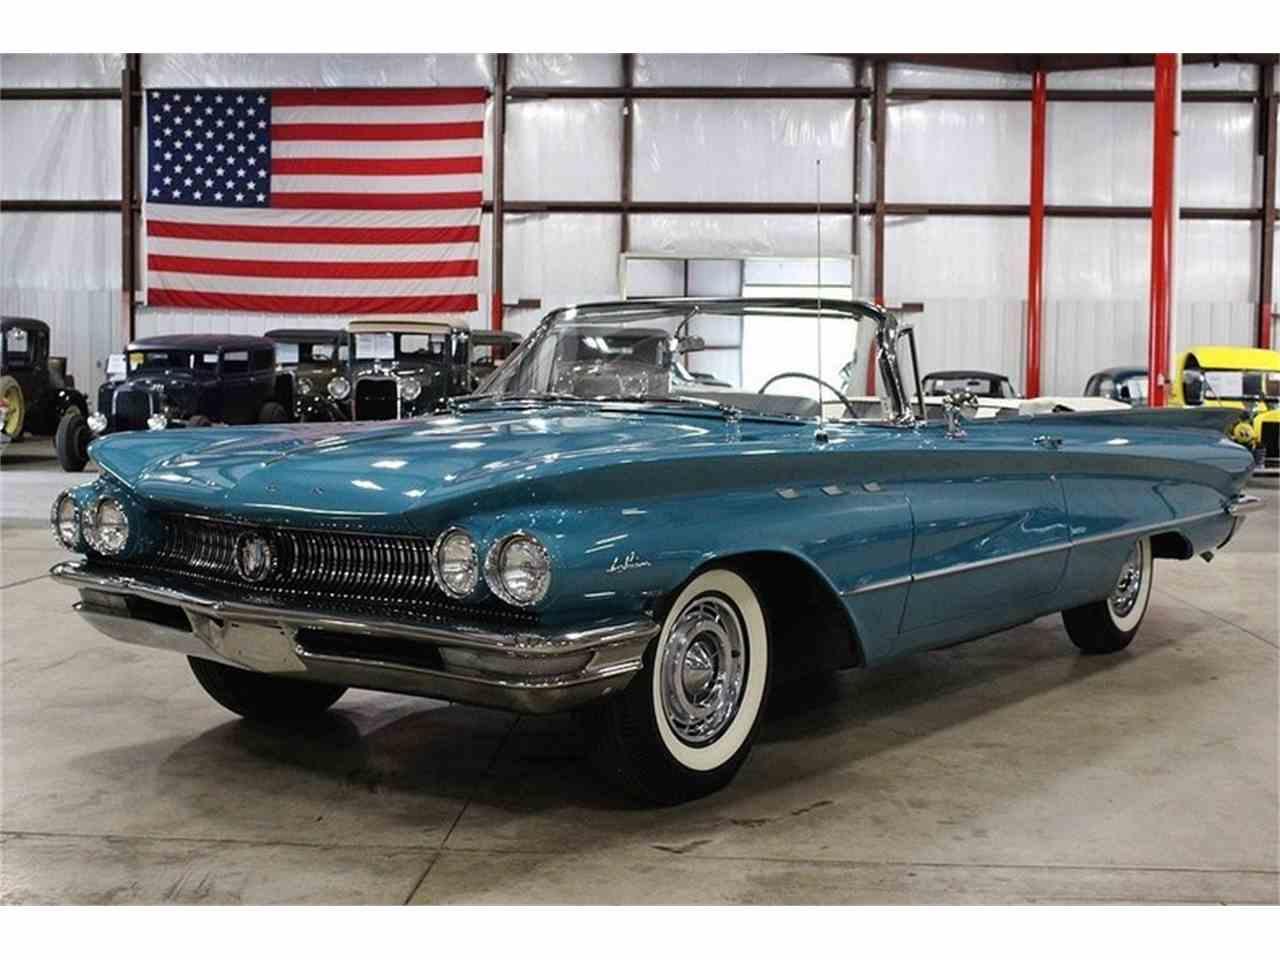 Buick Electra I 1959 - 1960 Cabriolet #3